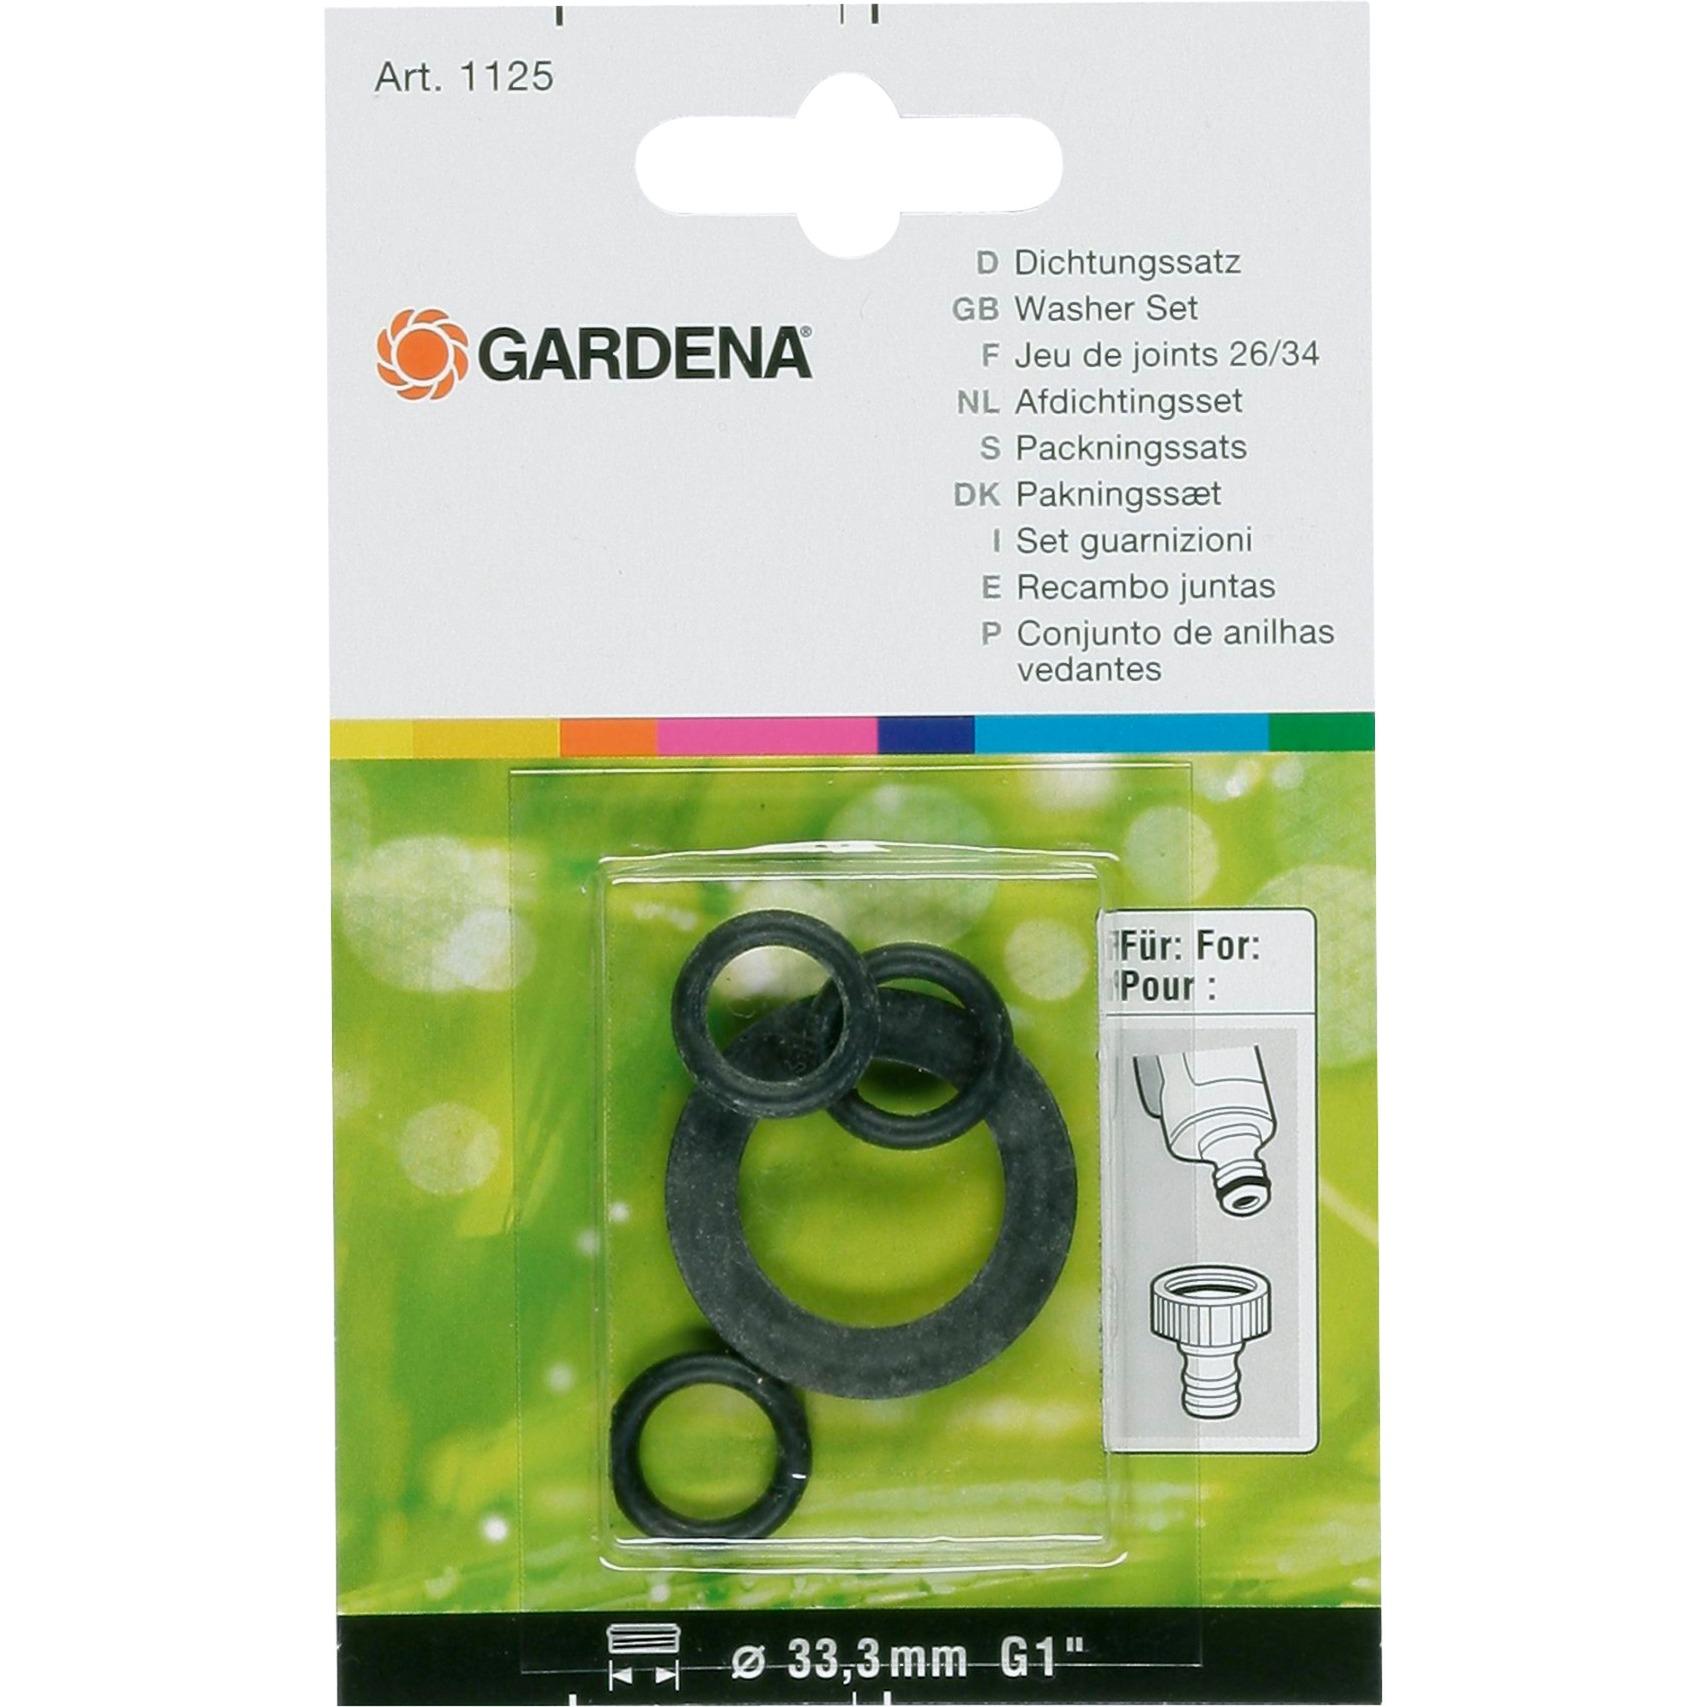 1125-ring-skarepakning-til-vandstraaledyse-pakning-tatning